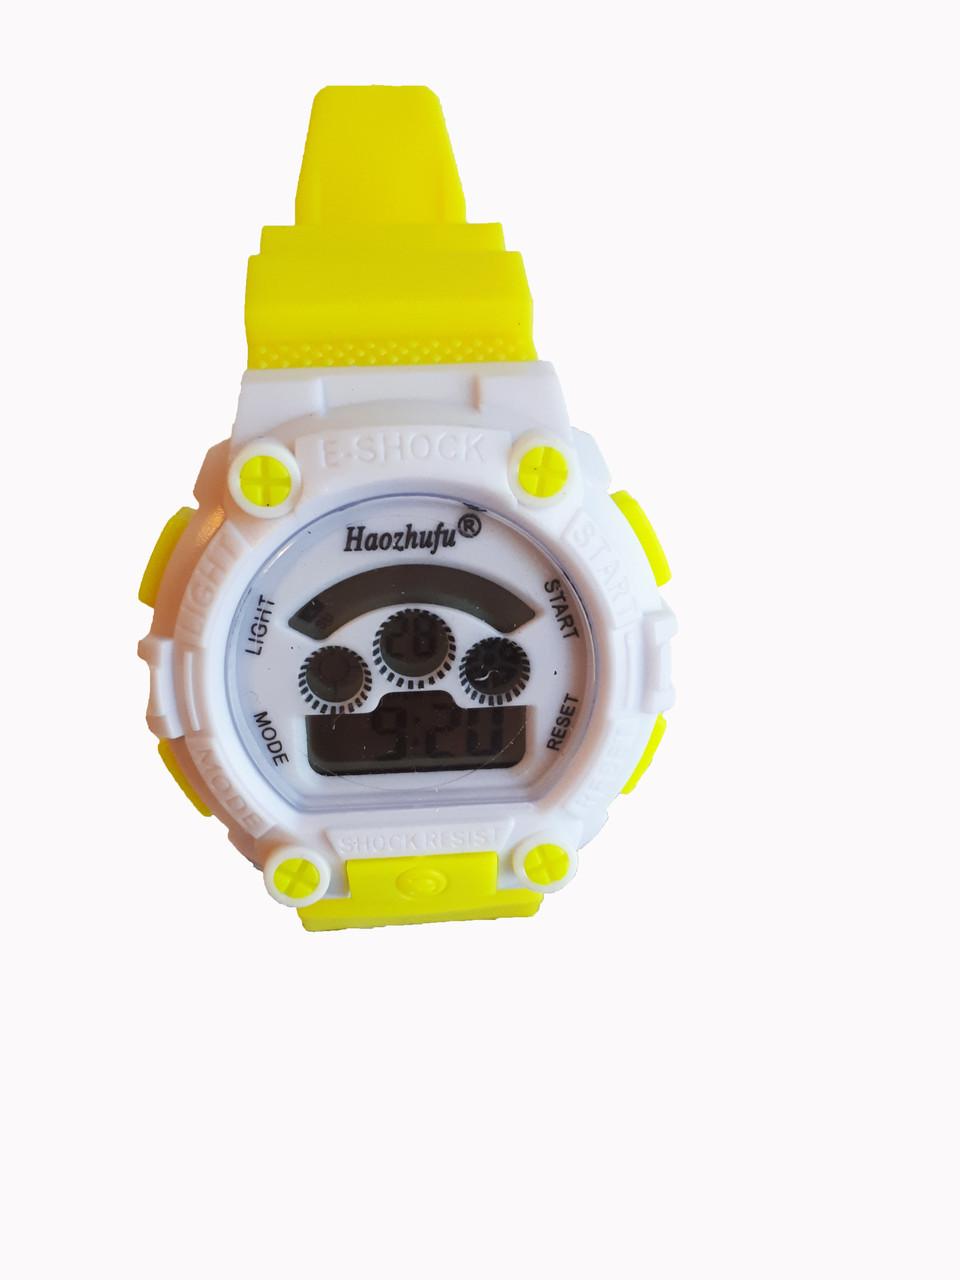 Детские электронные часы Haozhufu Желтые (Hzh-025Y)